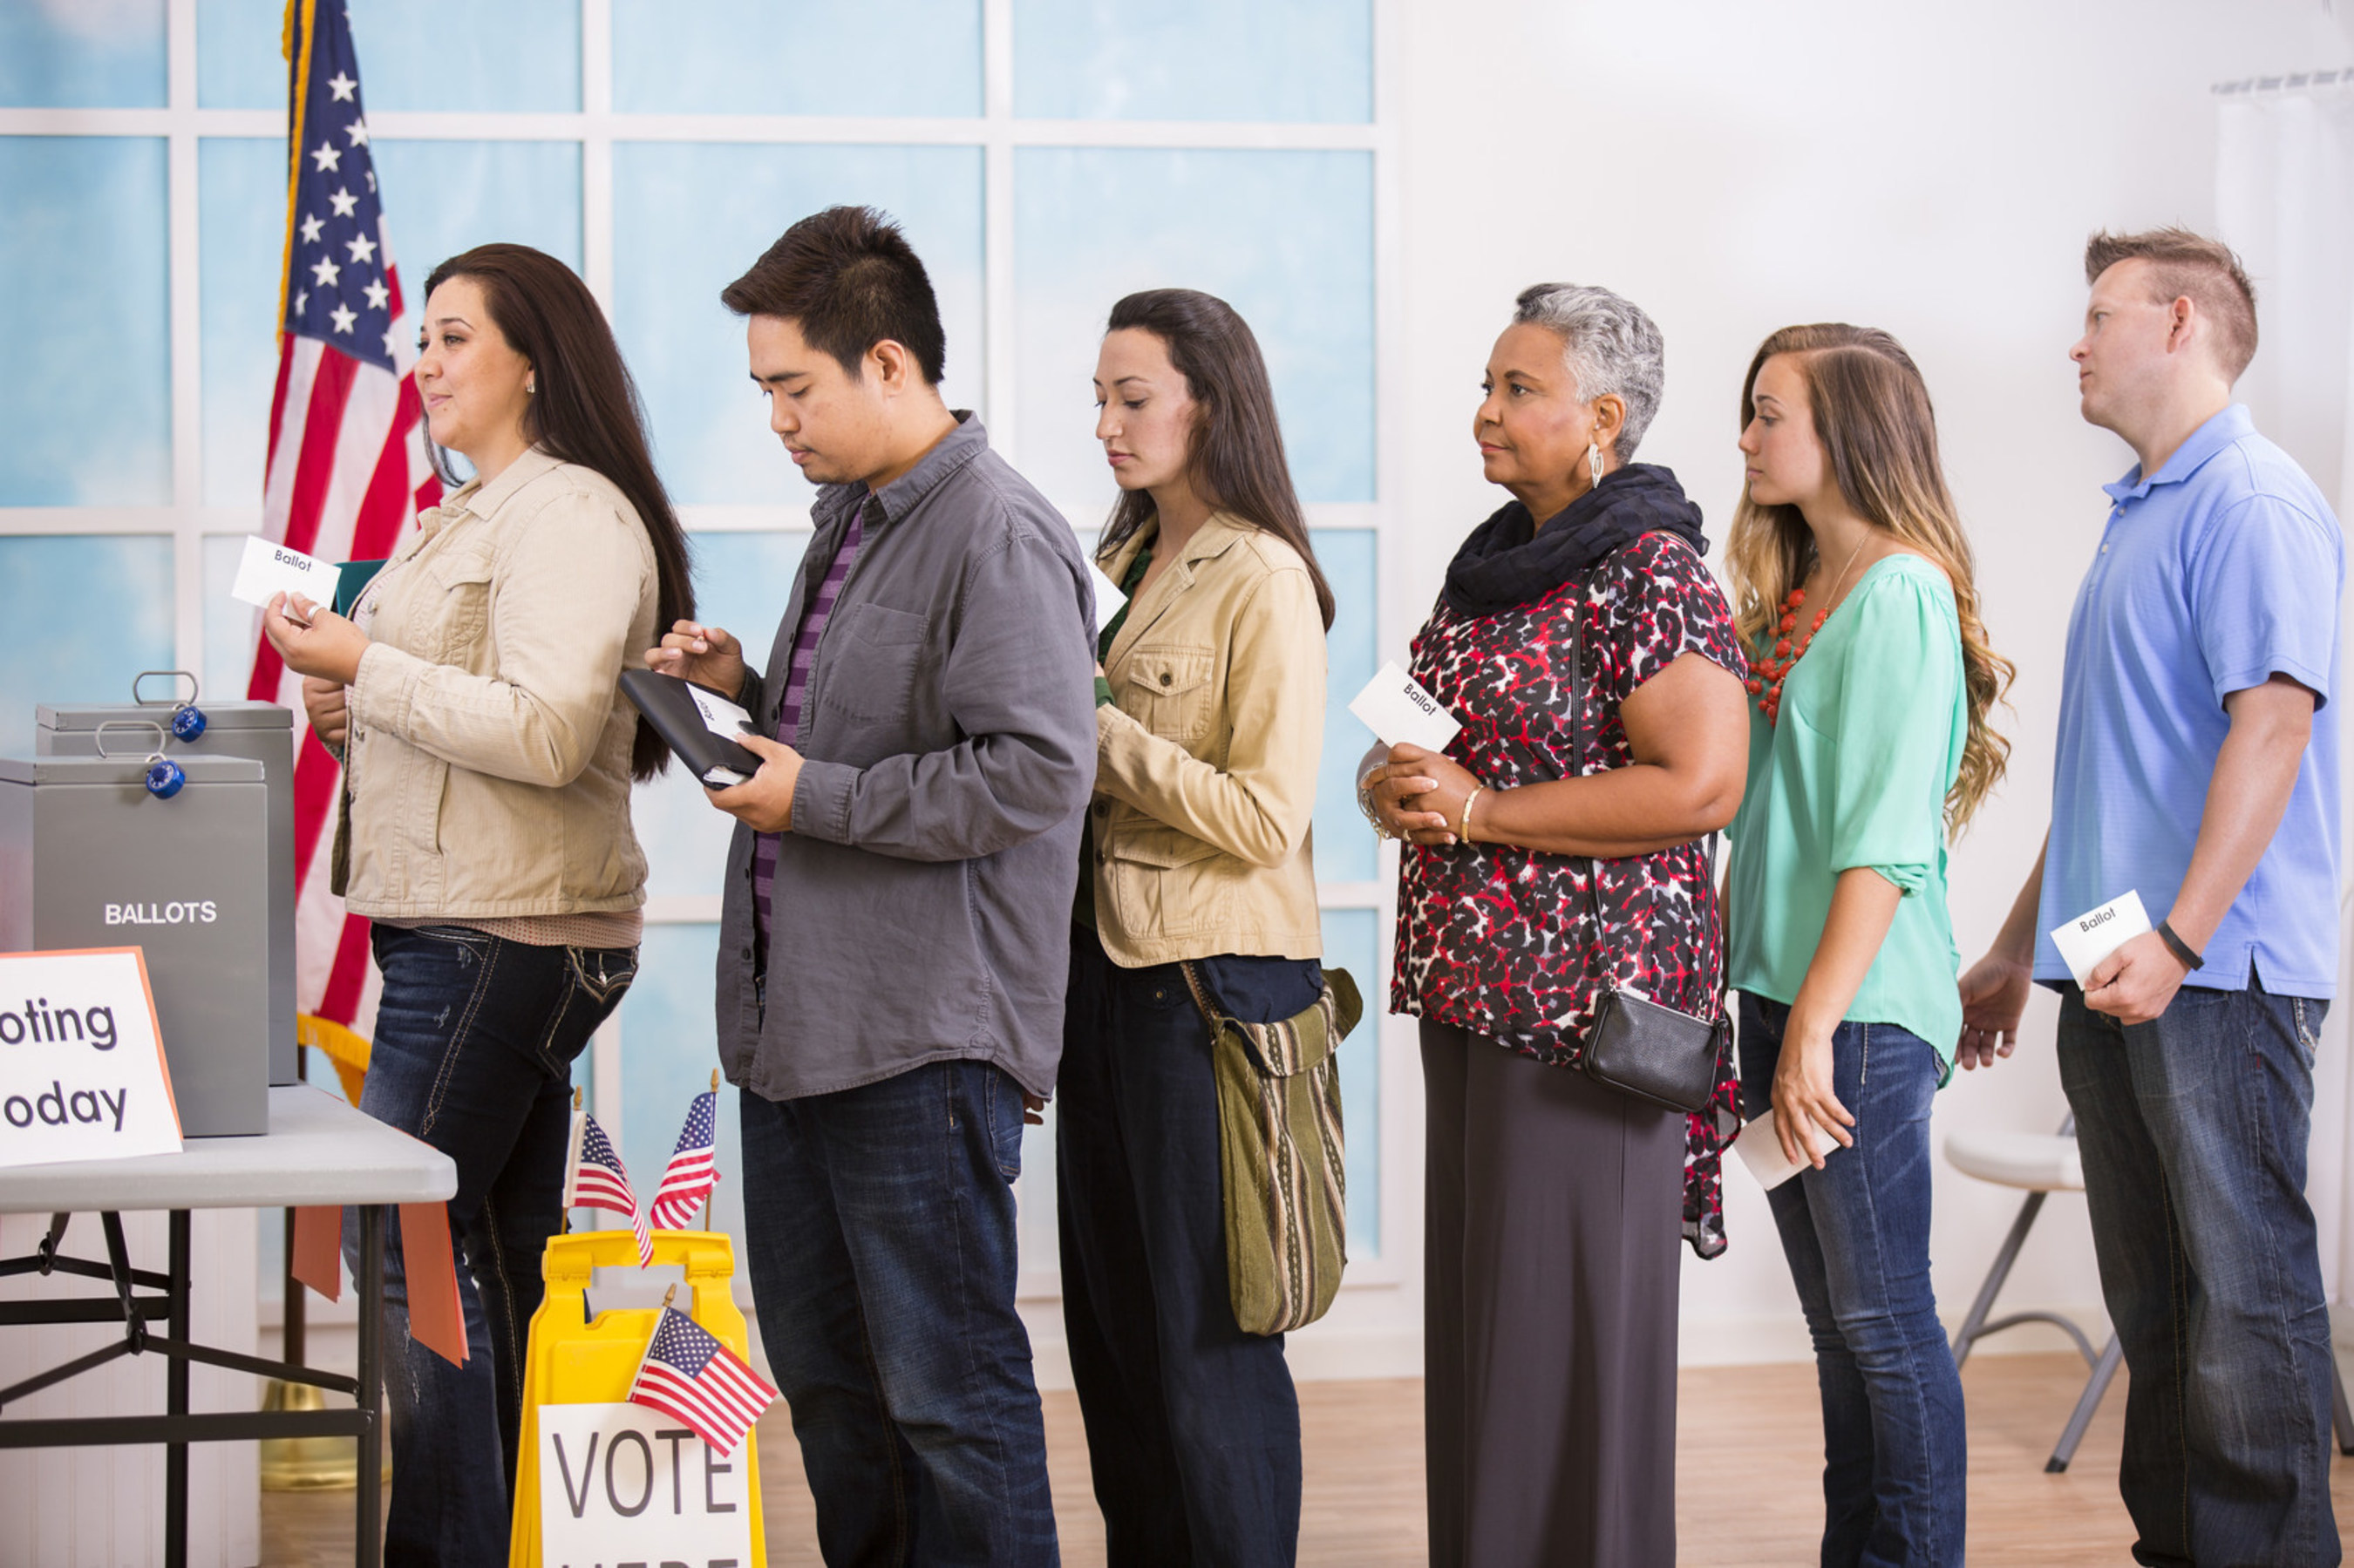 Straw Poll Vote online today! votethisorthat.com Photo Credit: Pamela Moore